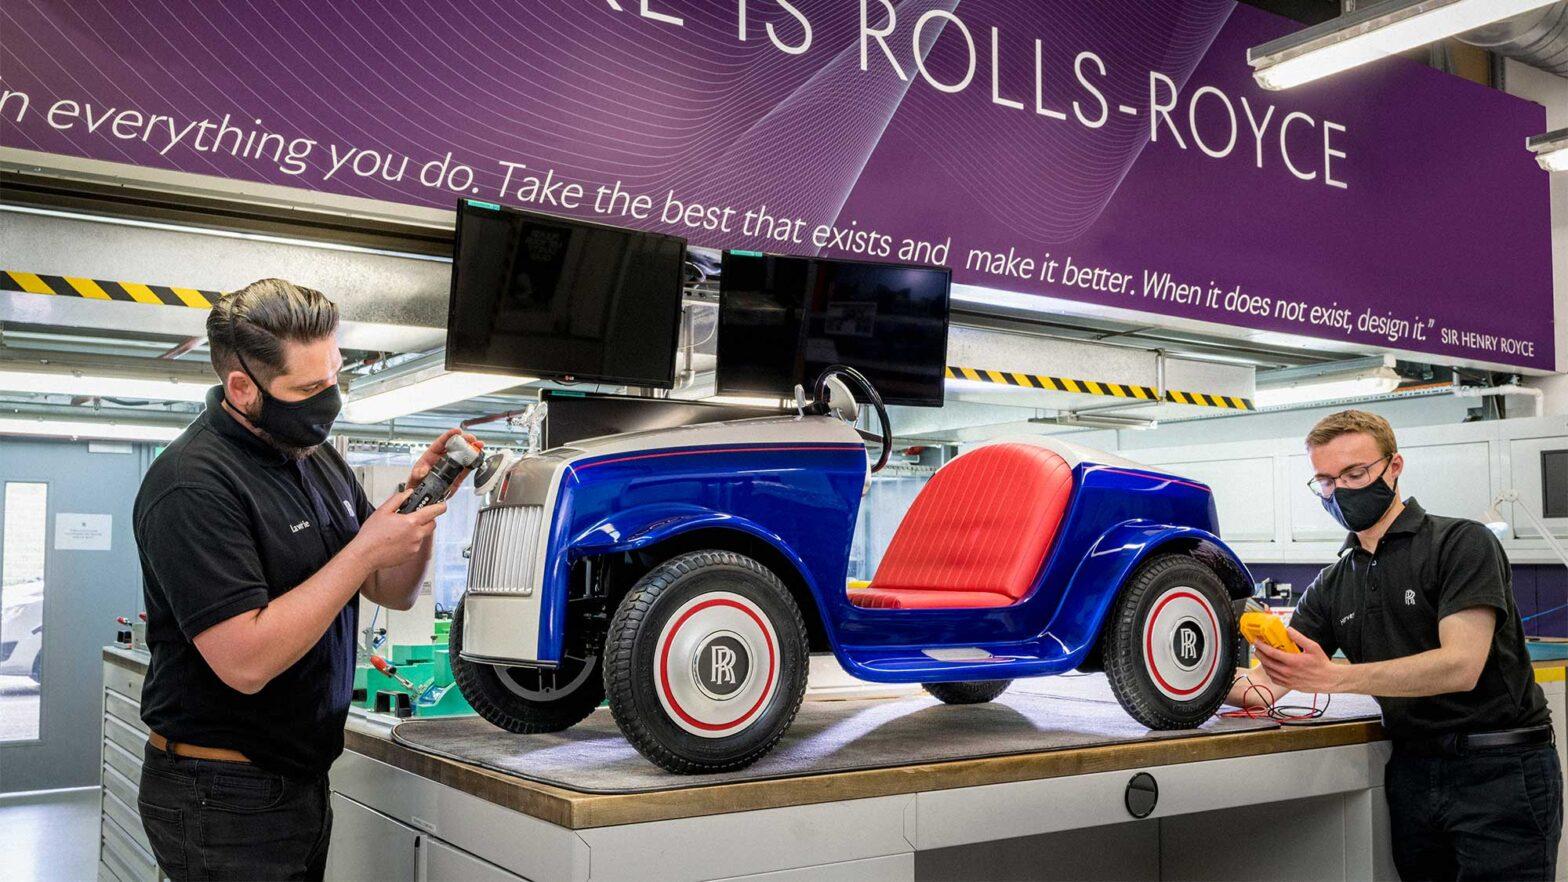 Rolls-Royce Kiddie Ride Serviced